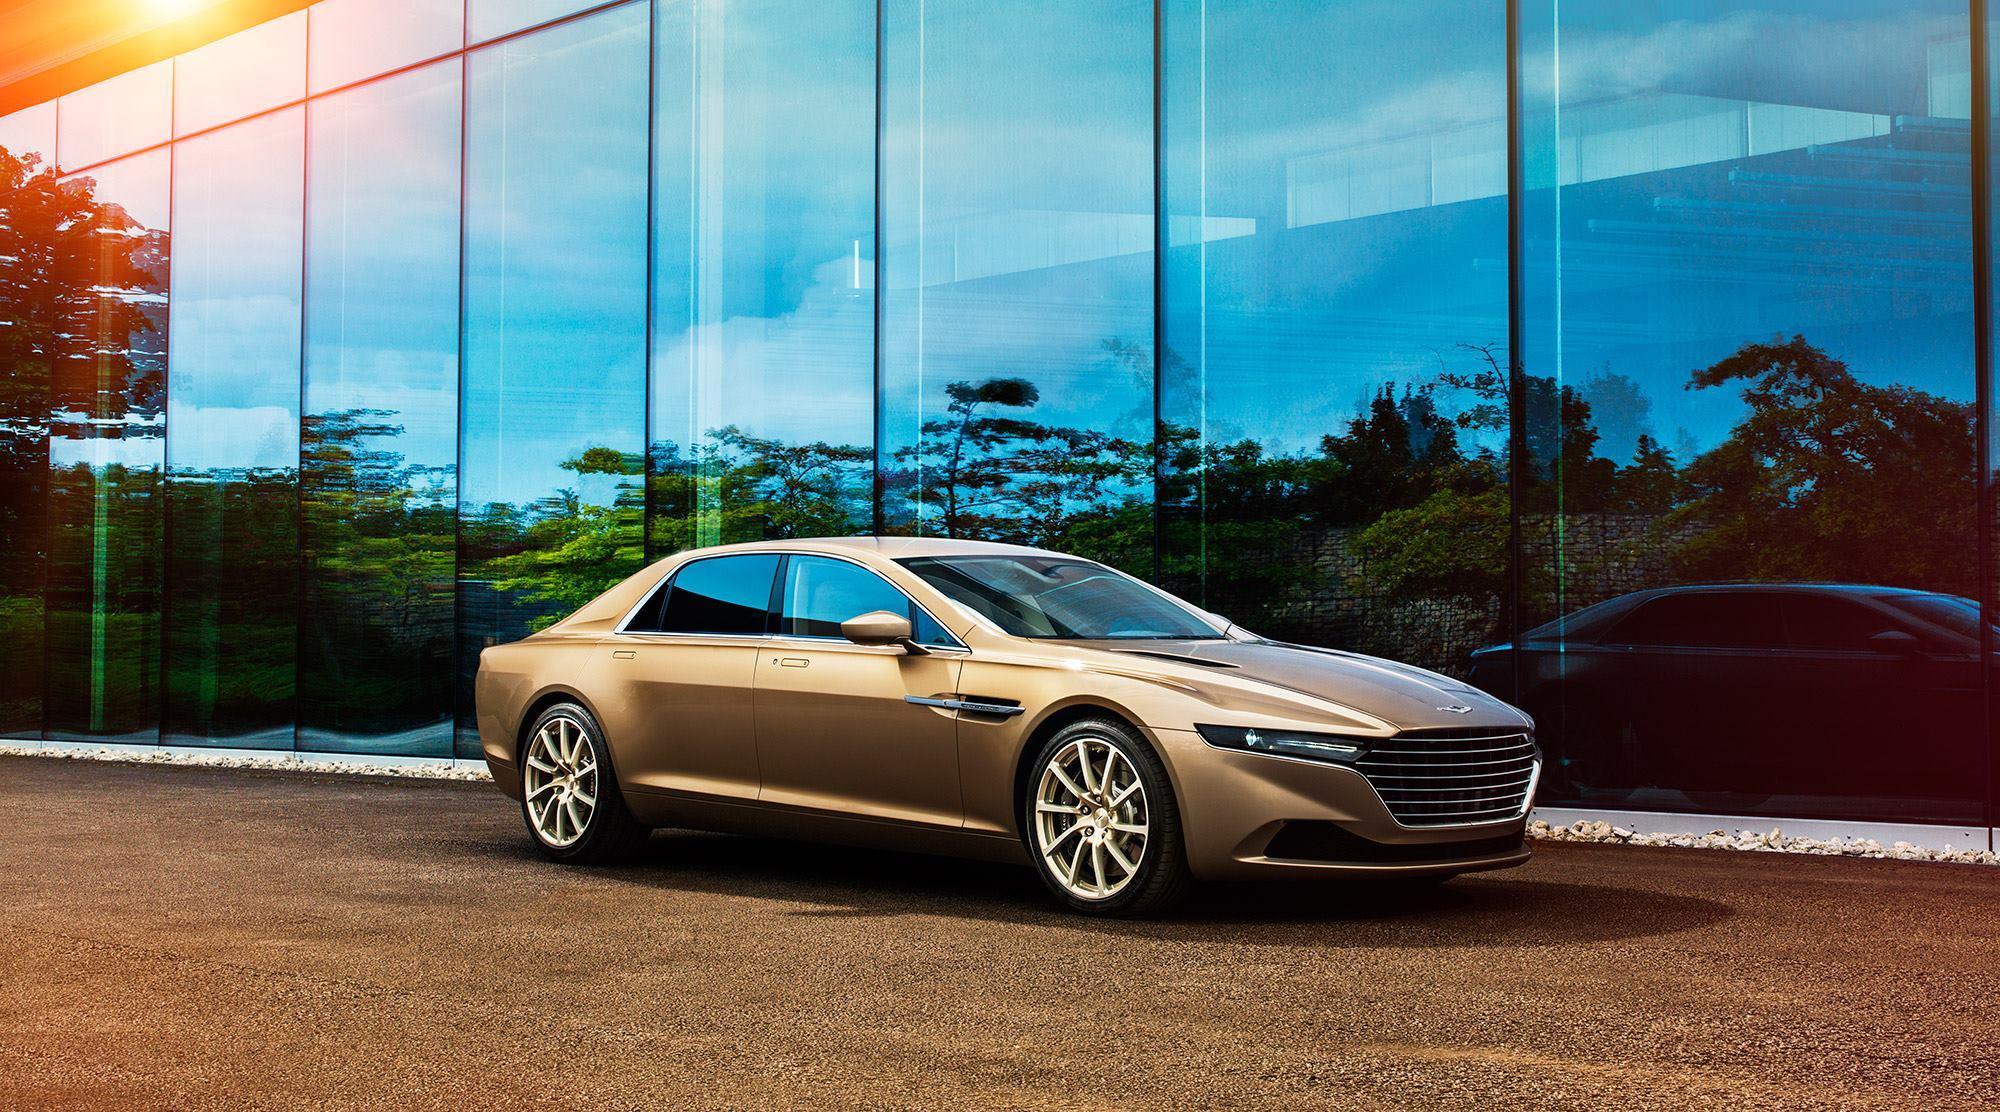 Aston Martin Lagonda Ltd